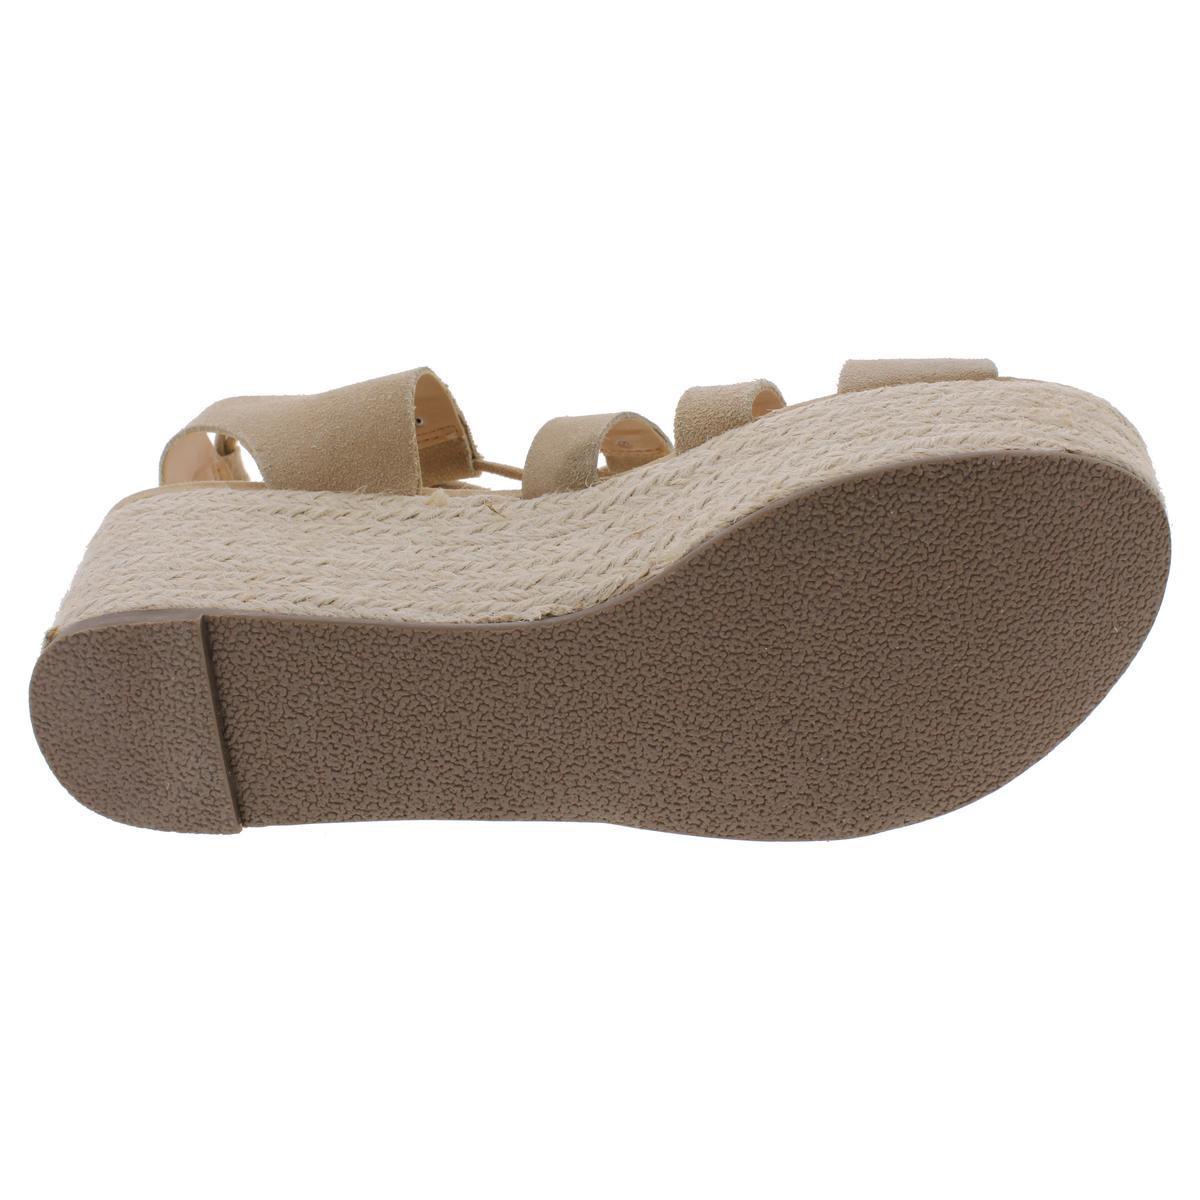 ff50b1c7e1b Lyst - Steve Madden Brayla Suede Ghillie Platform Sandals